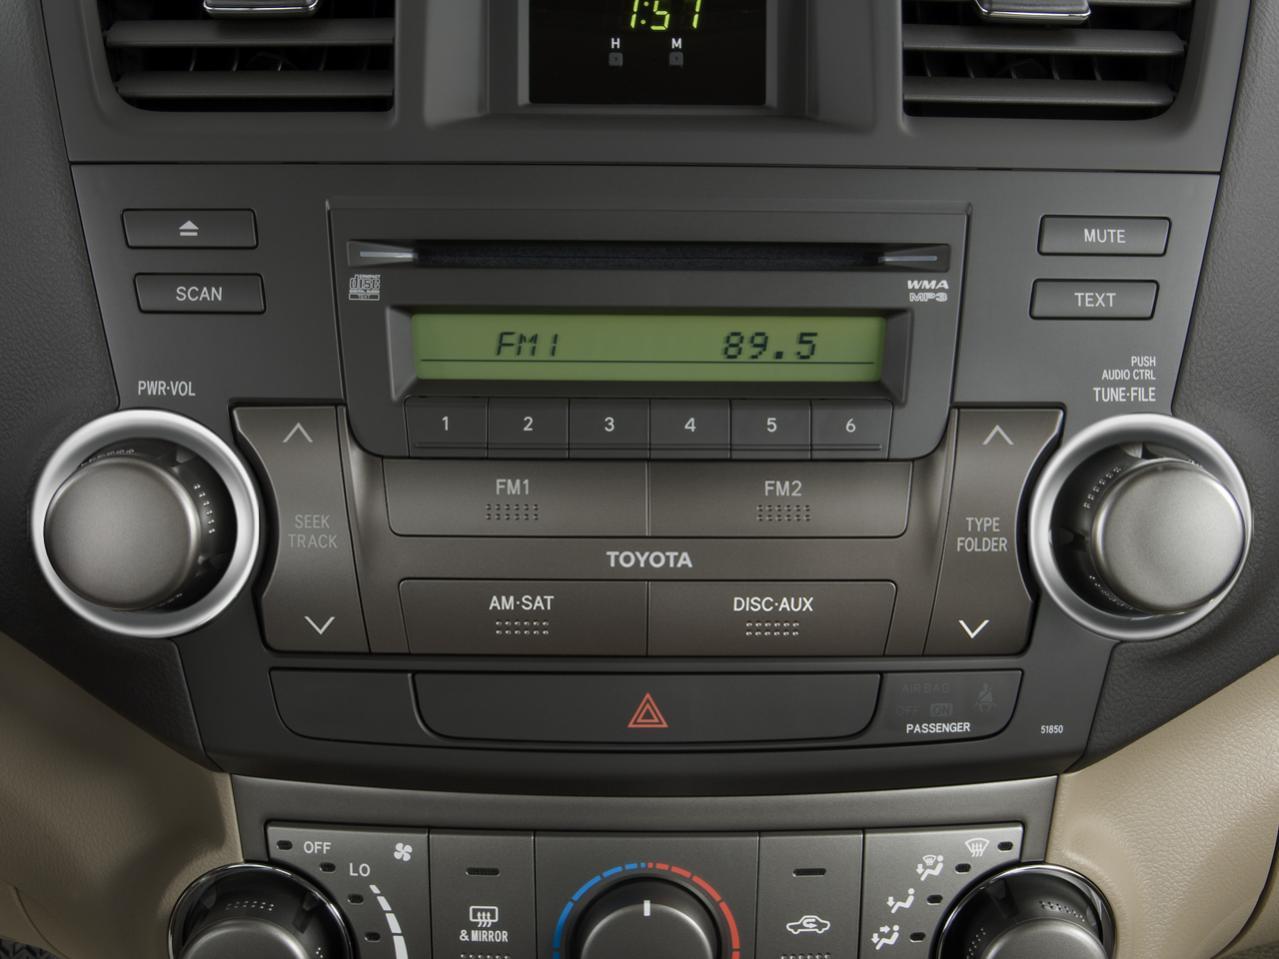 2008 highlander radio knob